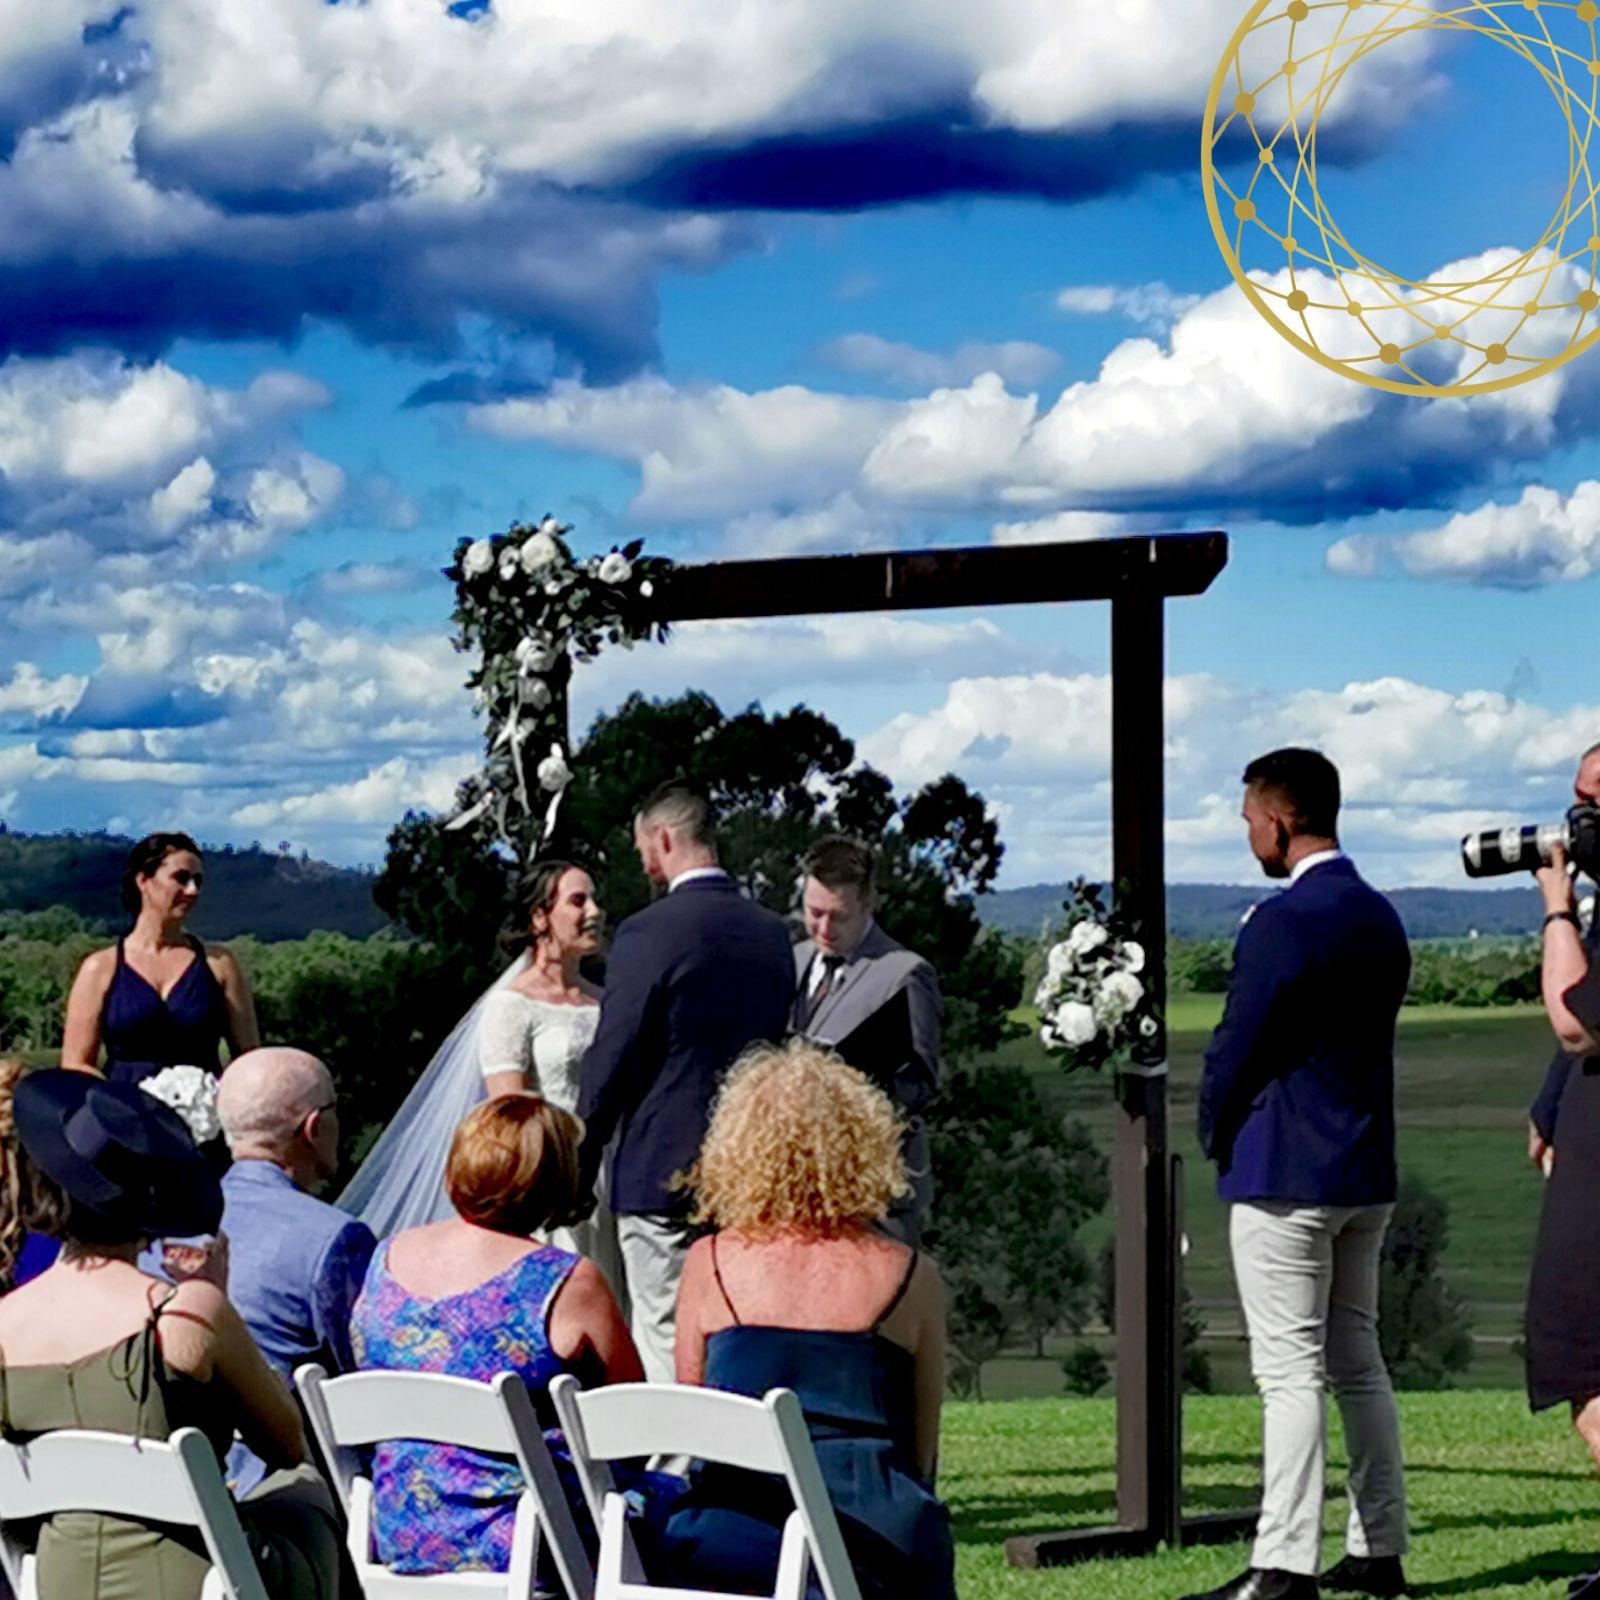 Outdoor Wedding Ceremony, Hunter Valley Wedding, Male Marriage Celebrant, Customised Ceremony, Sydney Marriage Celebrant